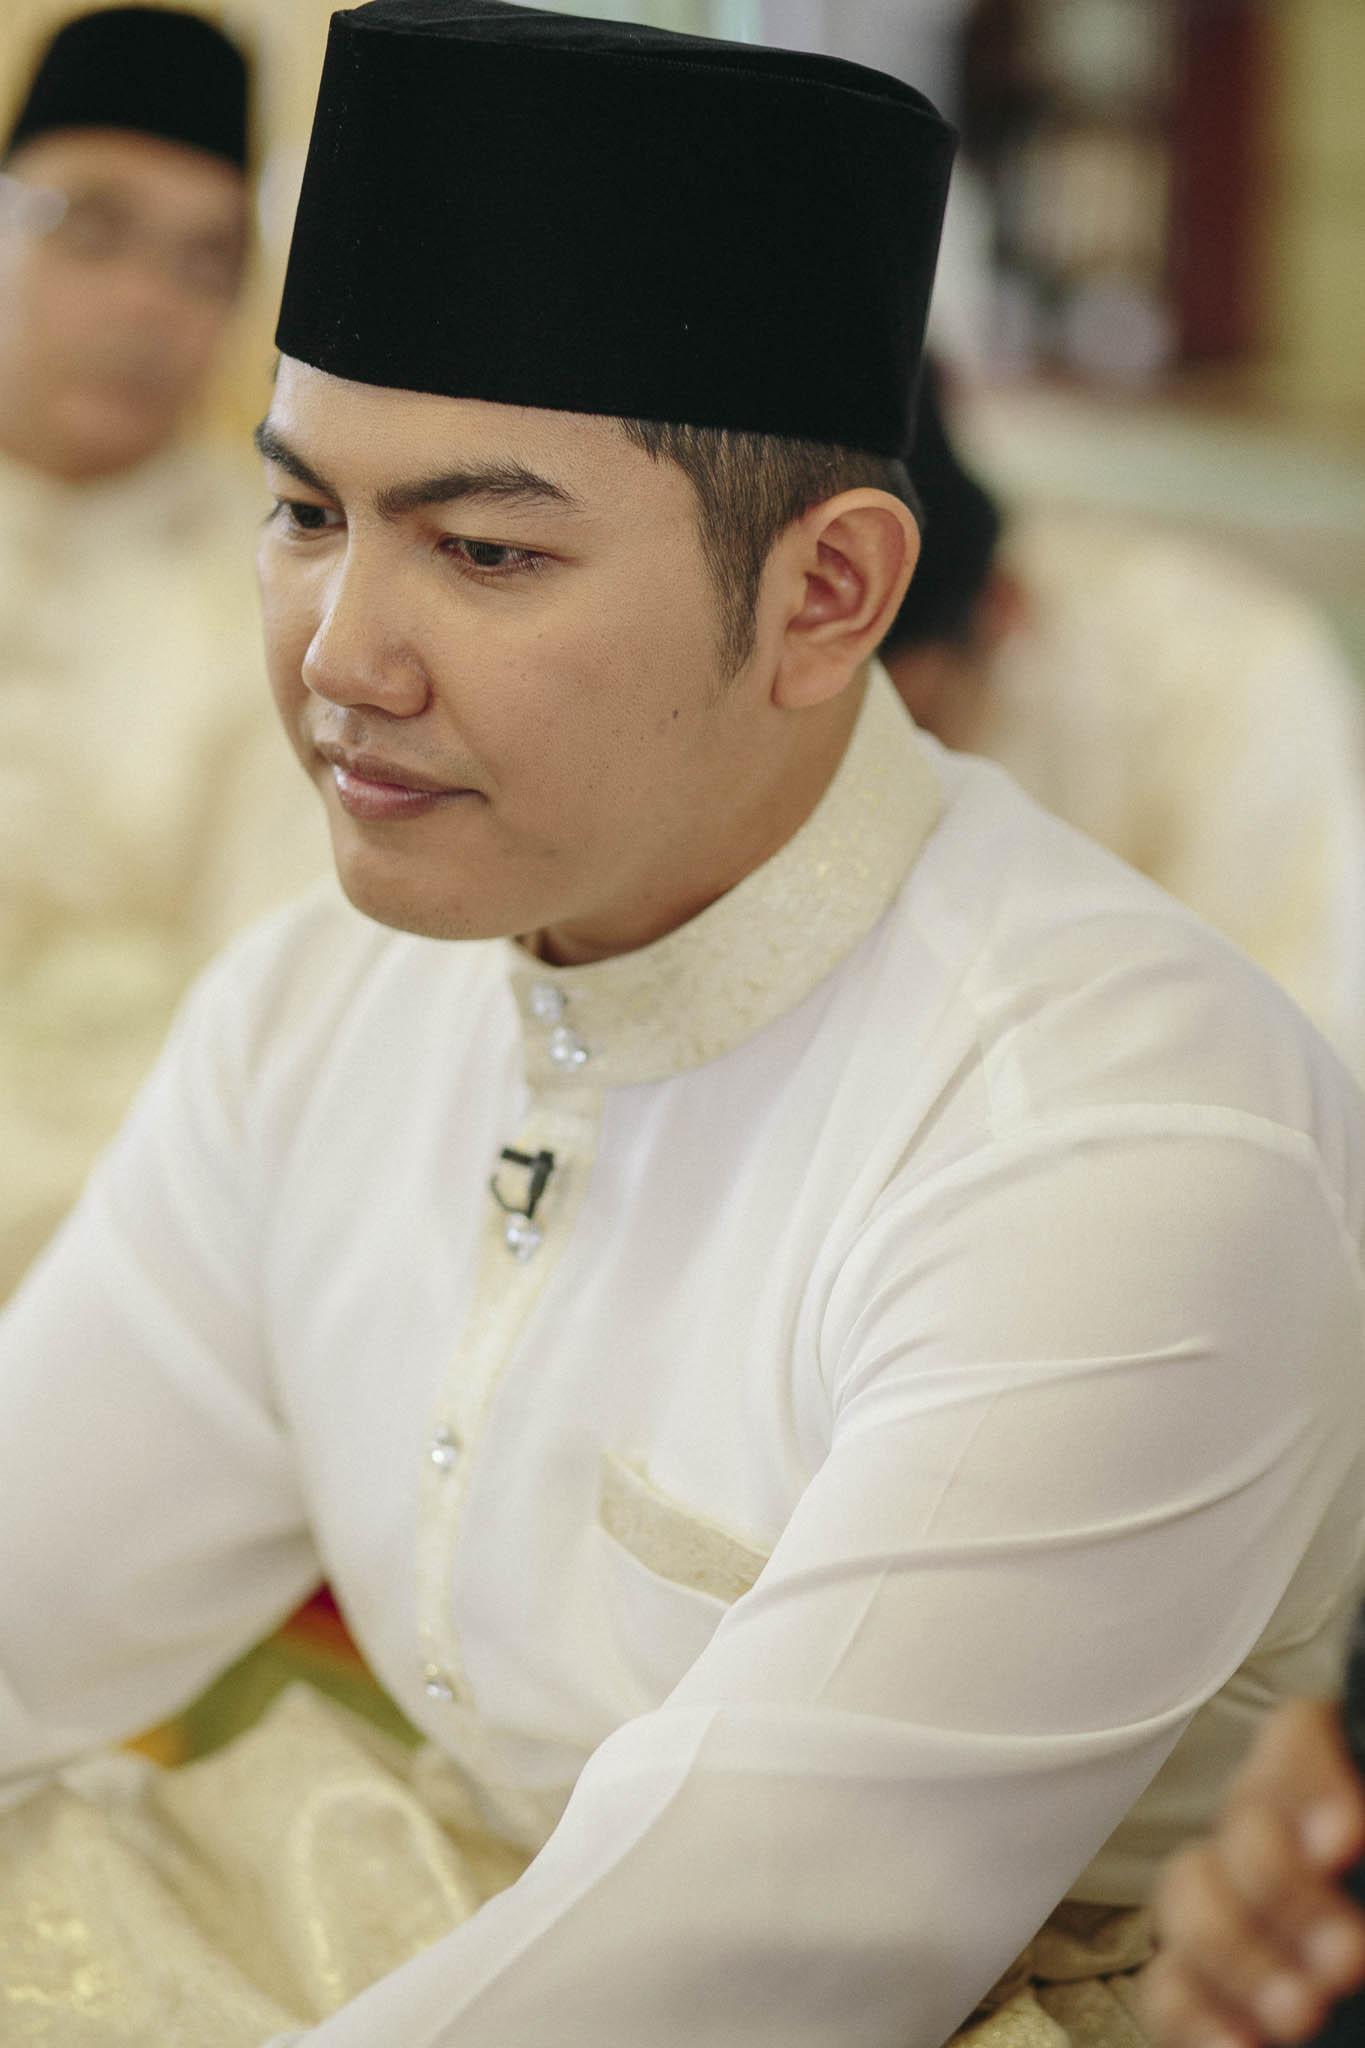 singapore-wedding-photographer-travel-khairul-atikah-14.jpg